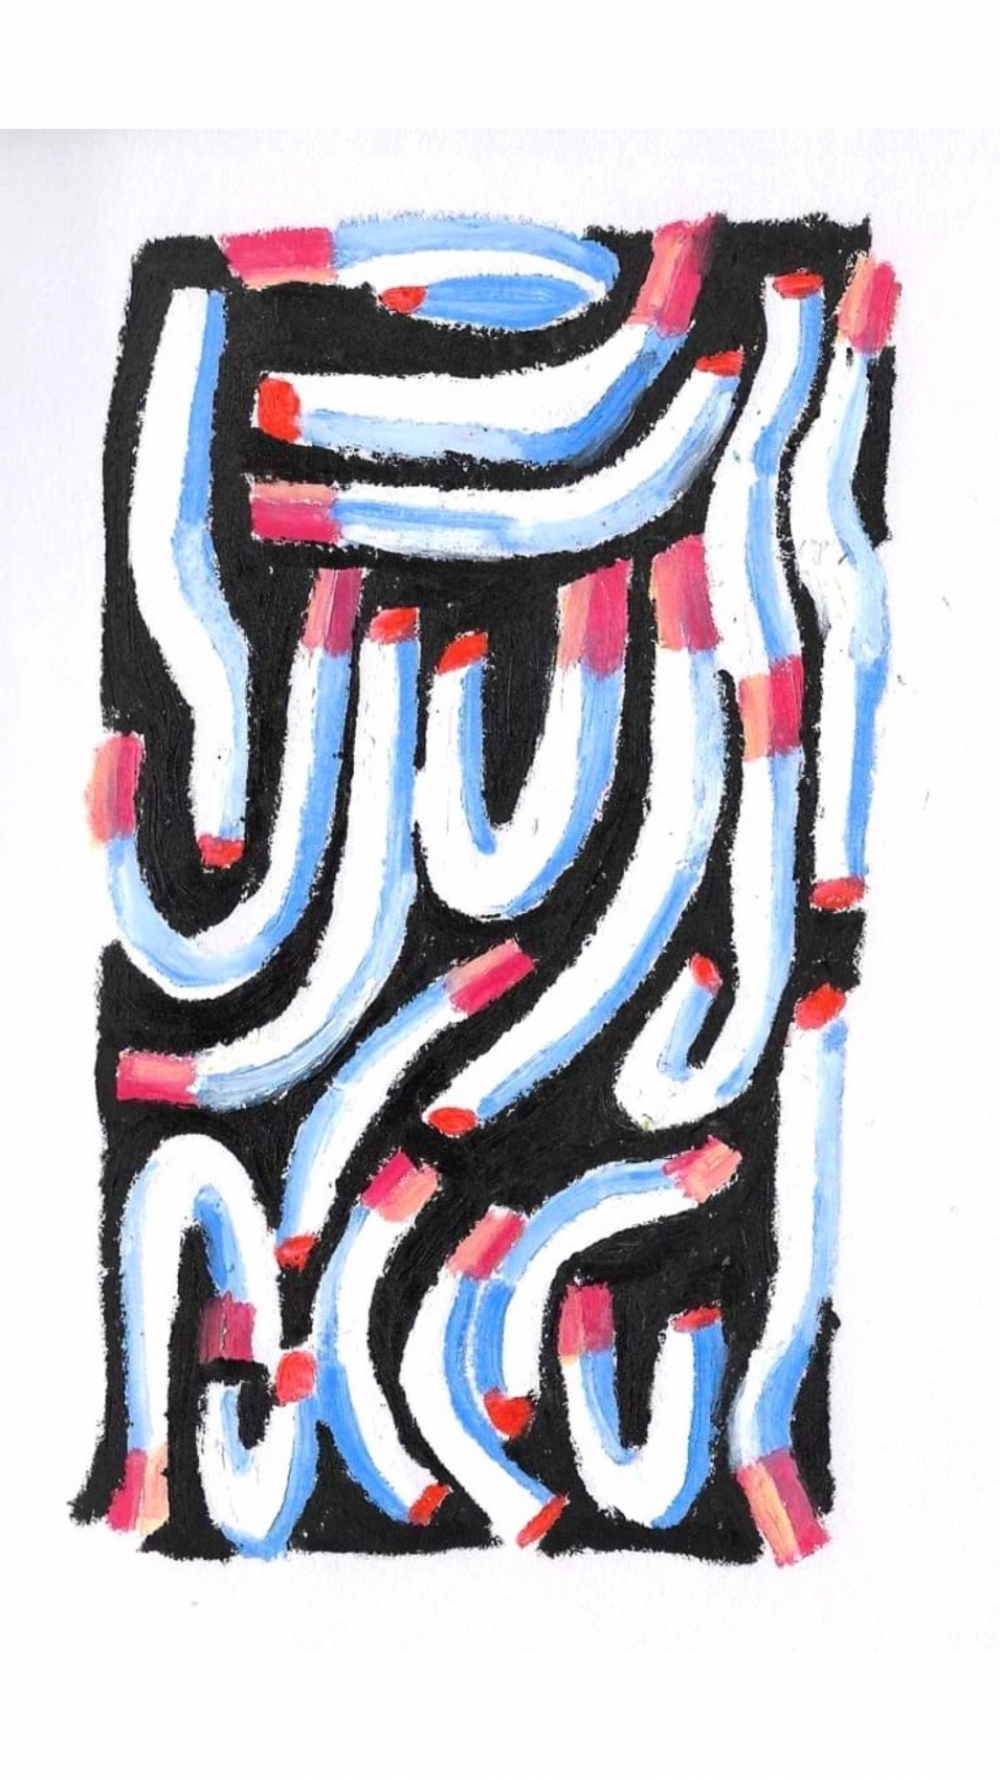 Anna Choutova - Cigarette Snakes 3 Oil Pastel on Paper21 cm x 15 cm